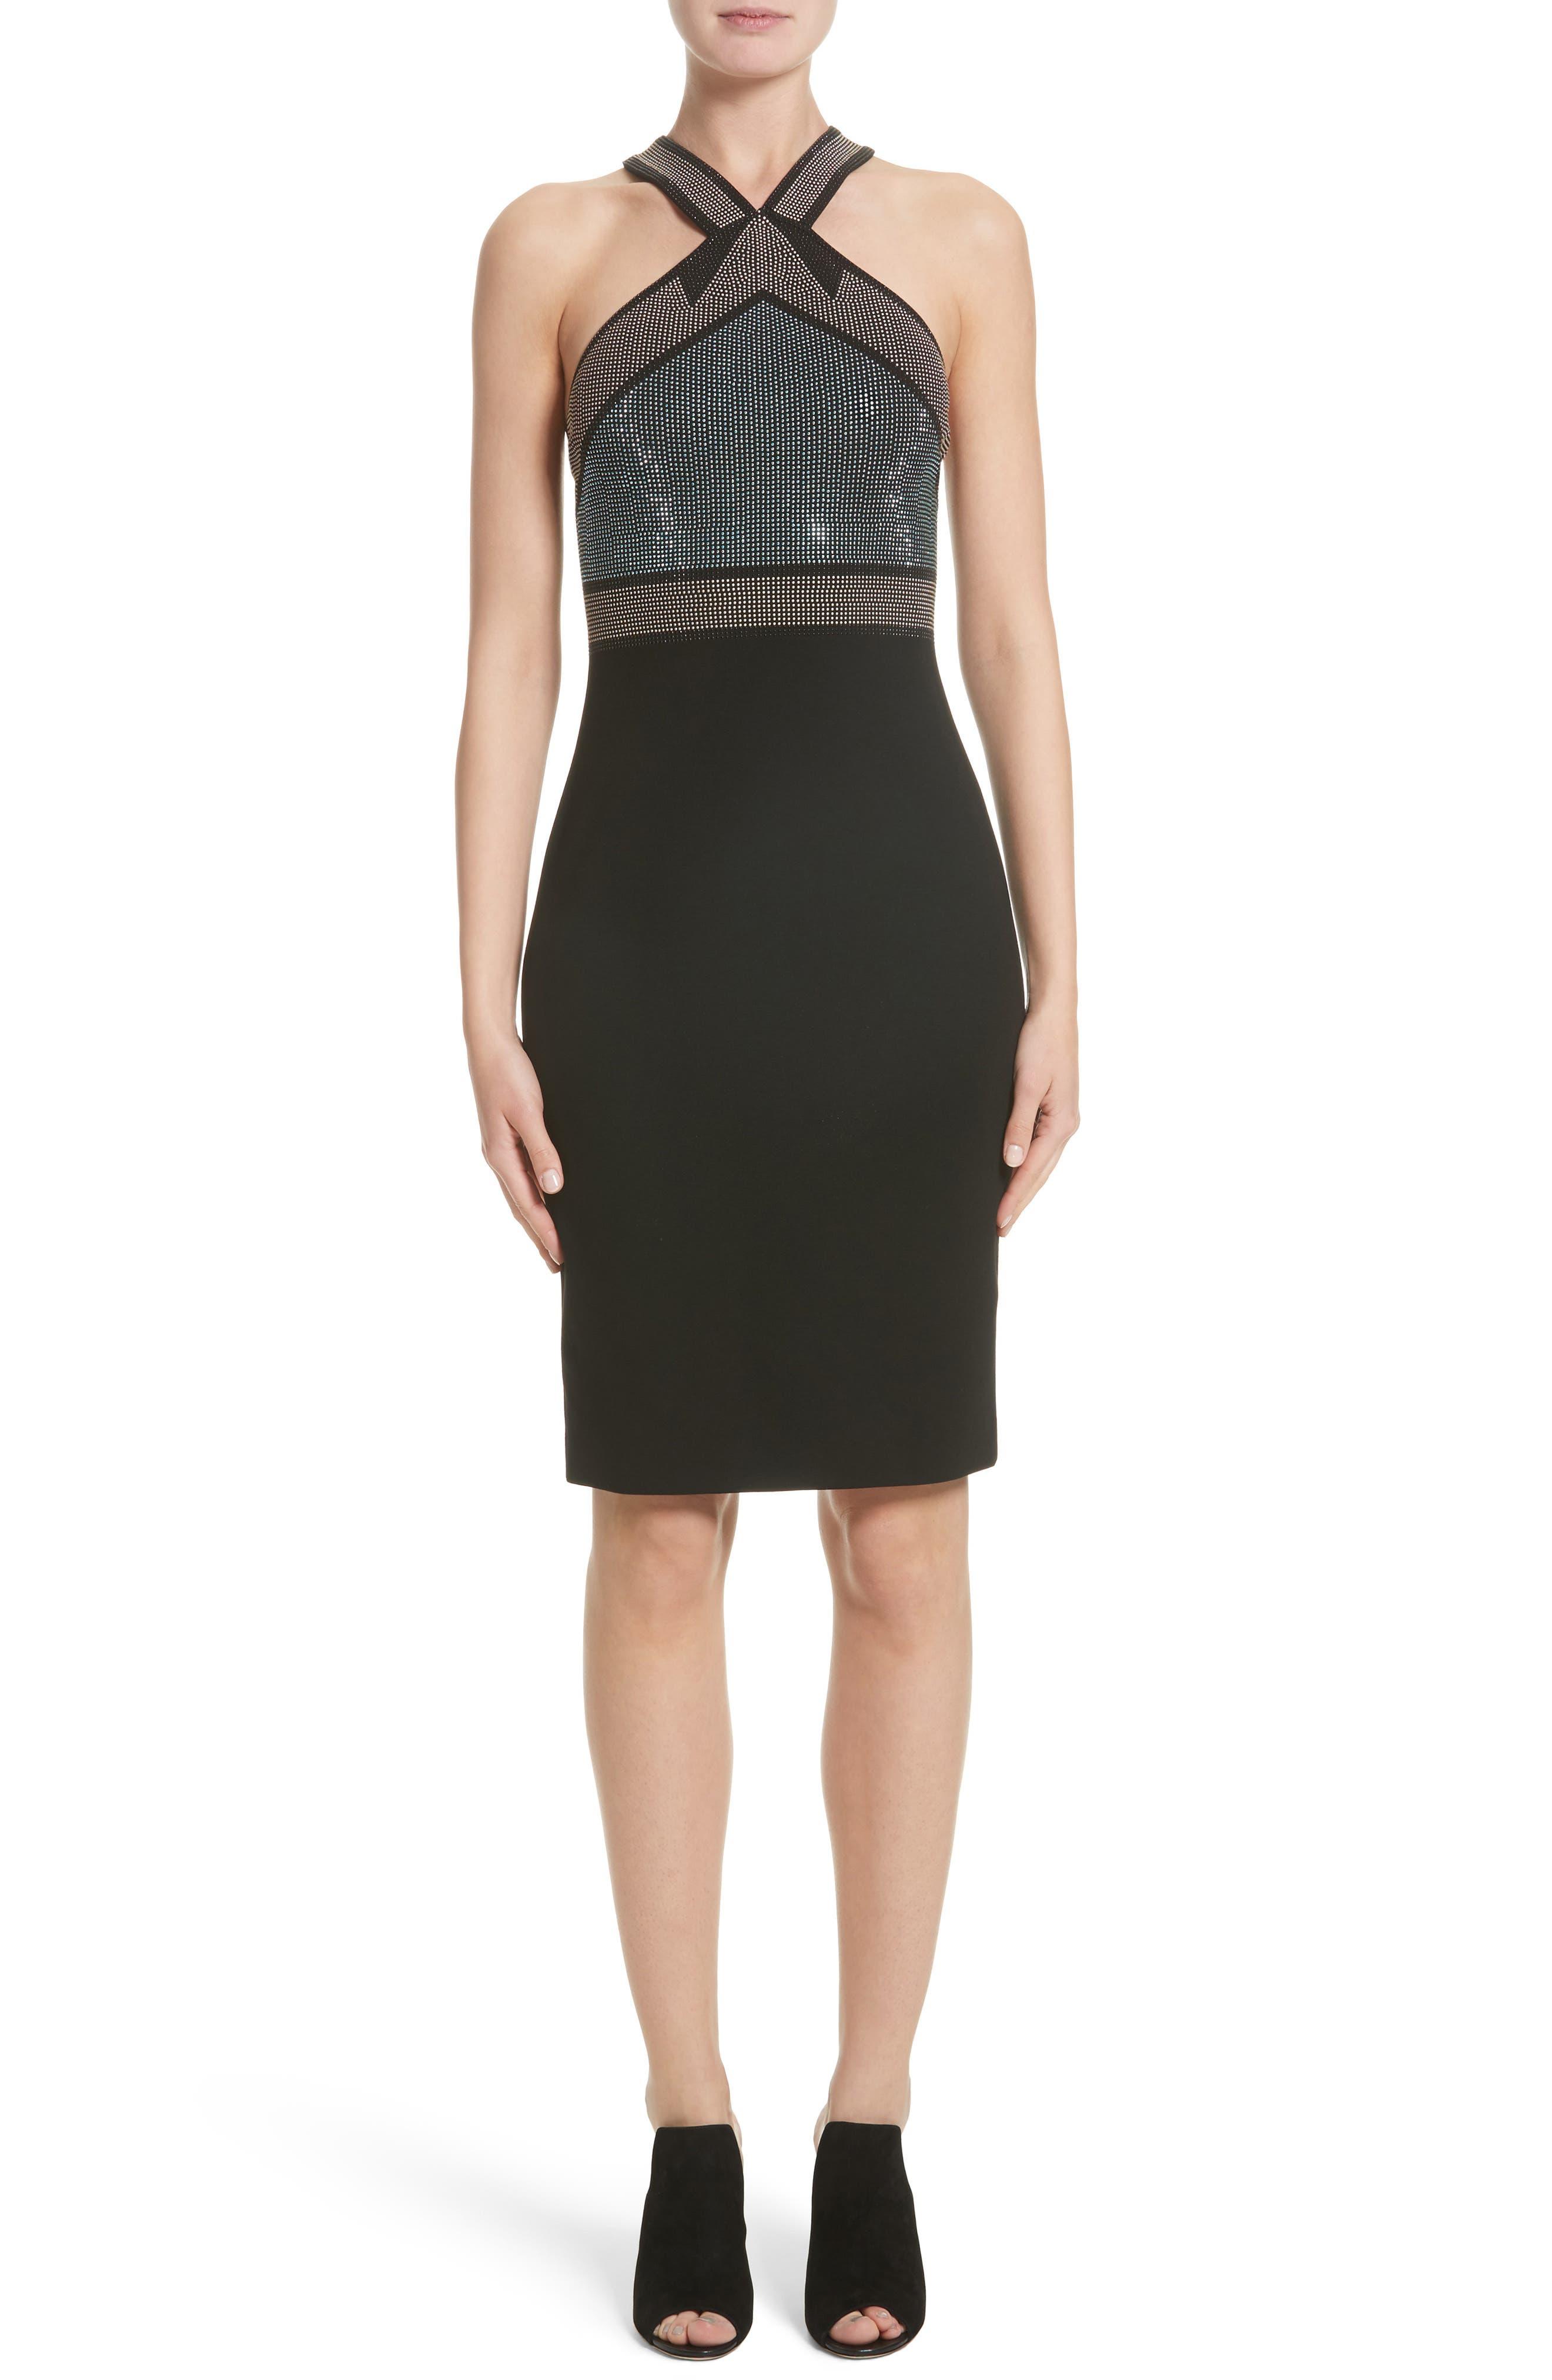 Alternate Image 1 Selected - Versace Rhinestone Halter Dress